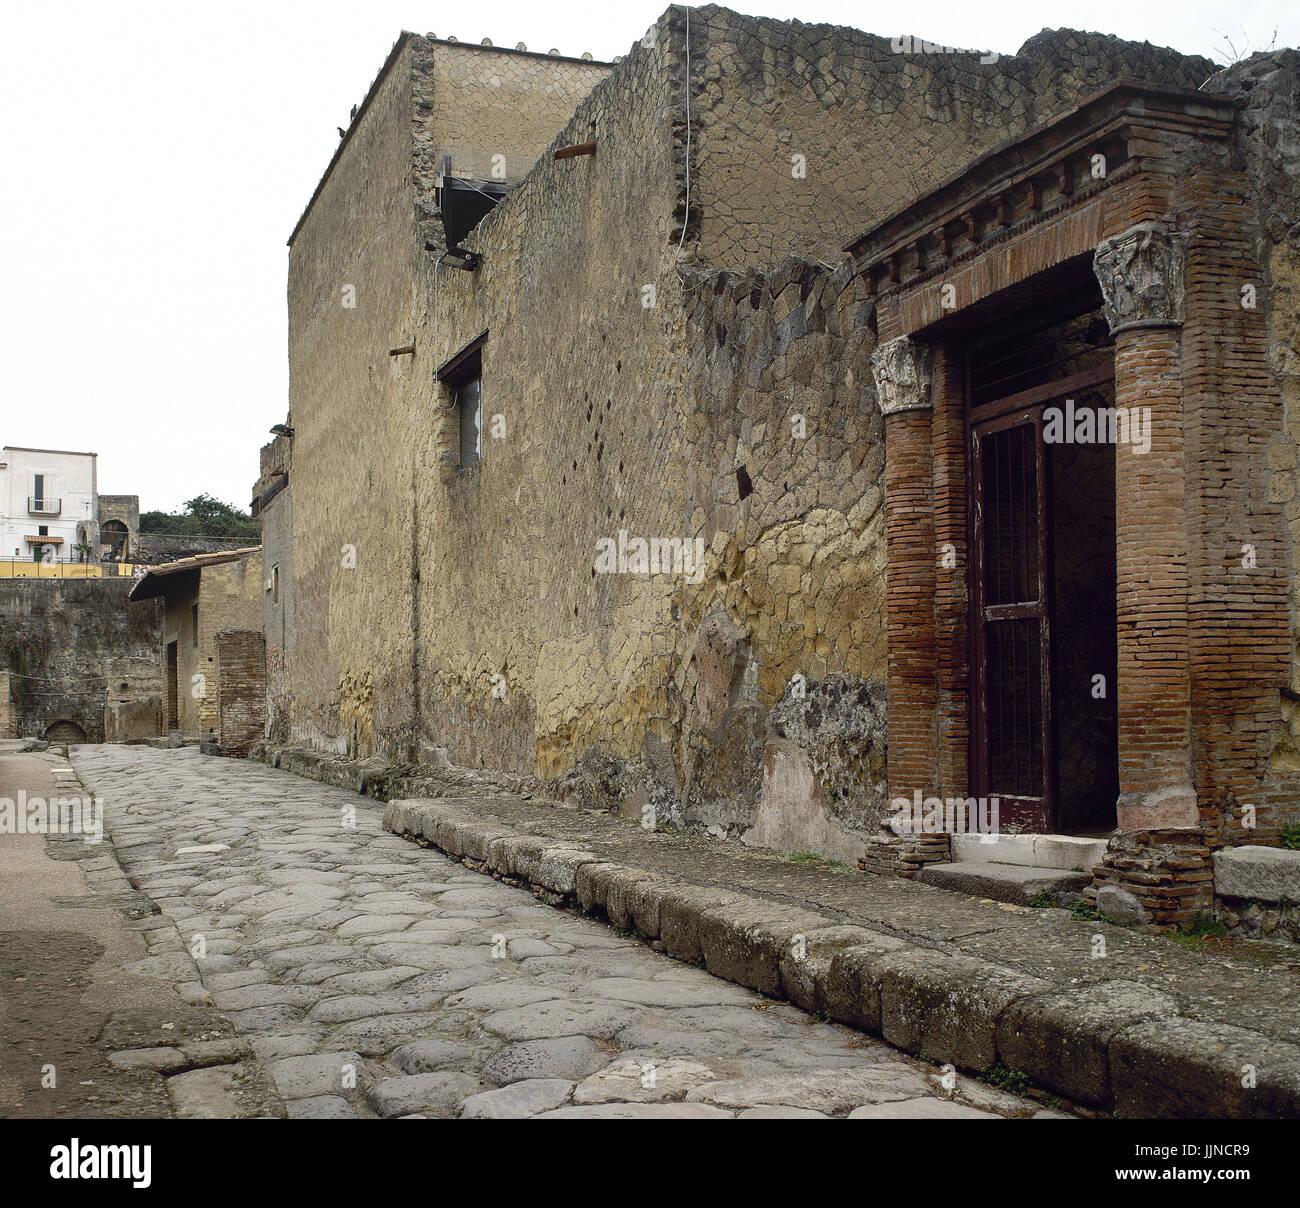 Italy. Herculaneum. View of Decumanus inferior. Campania. - Stock Image